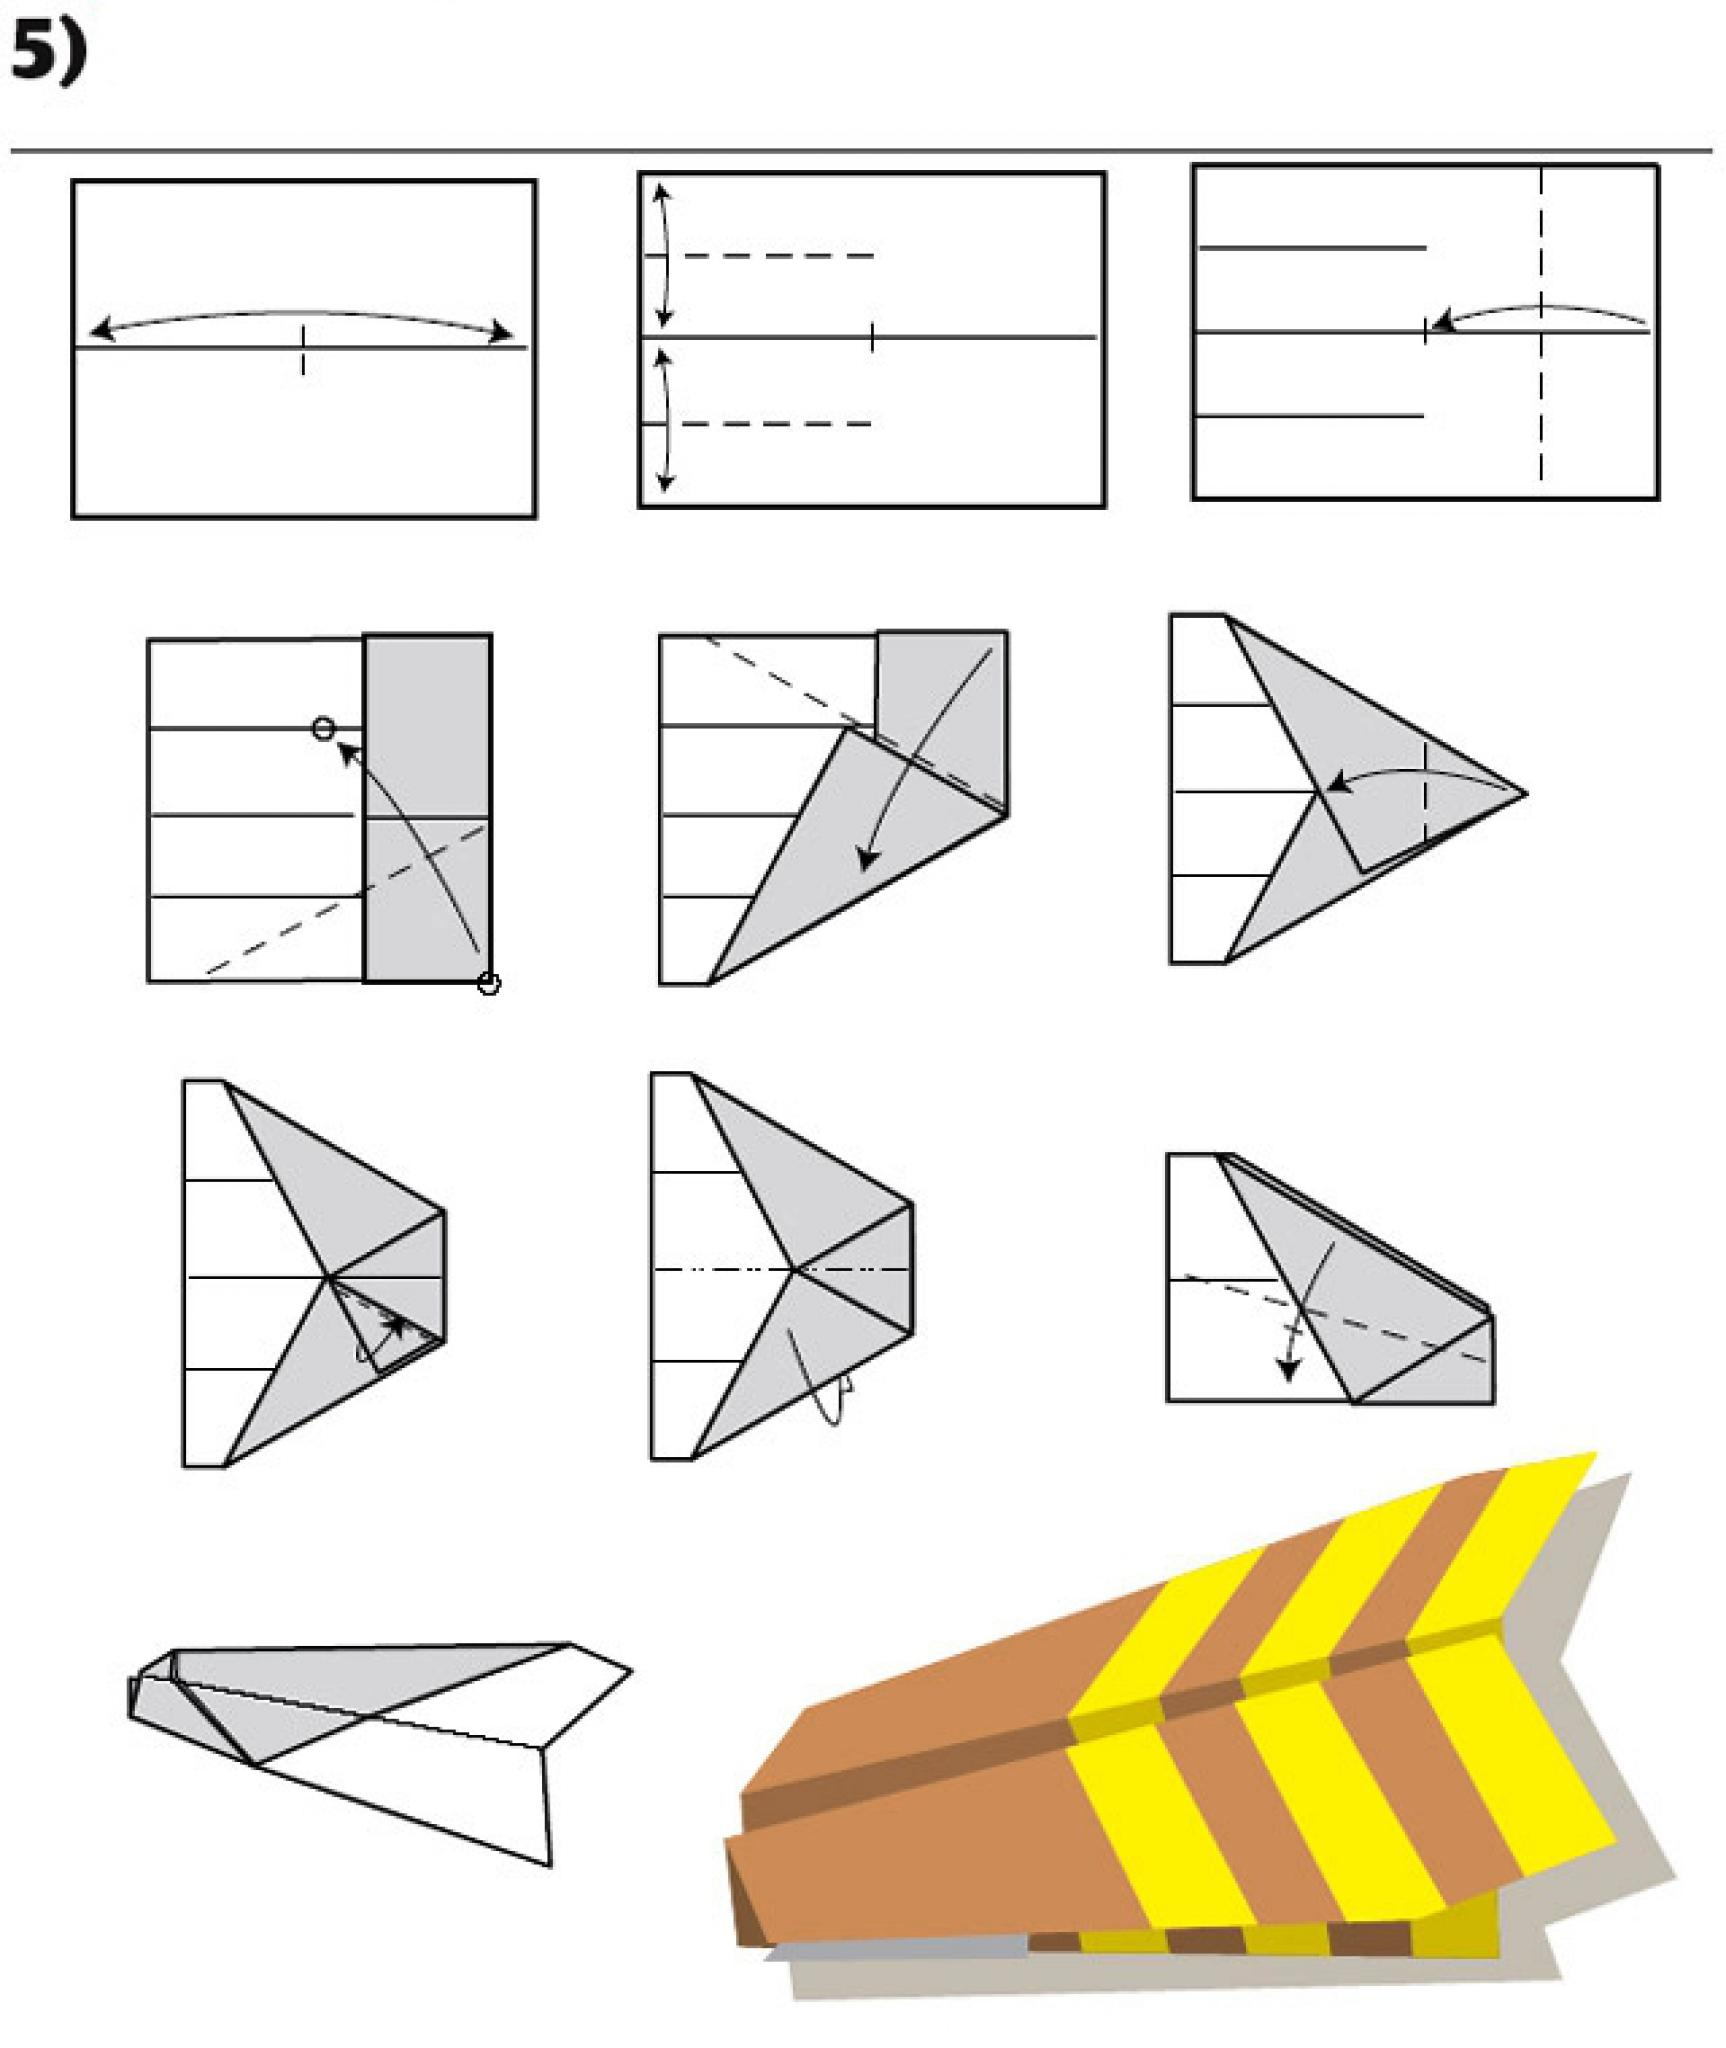 Усилитель edge ed7200-e1 схема